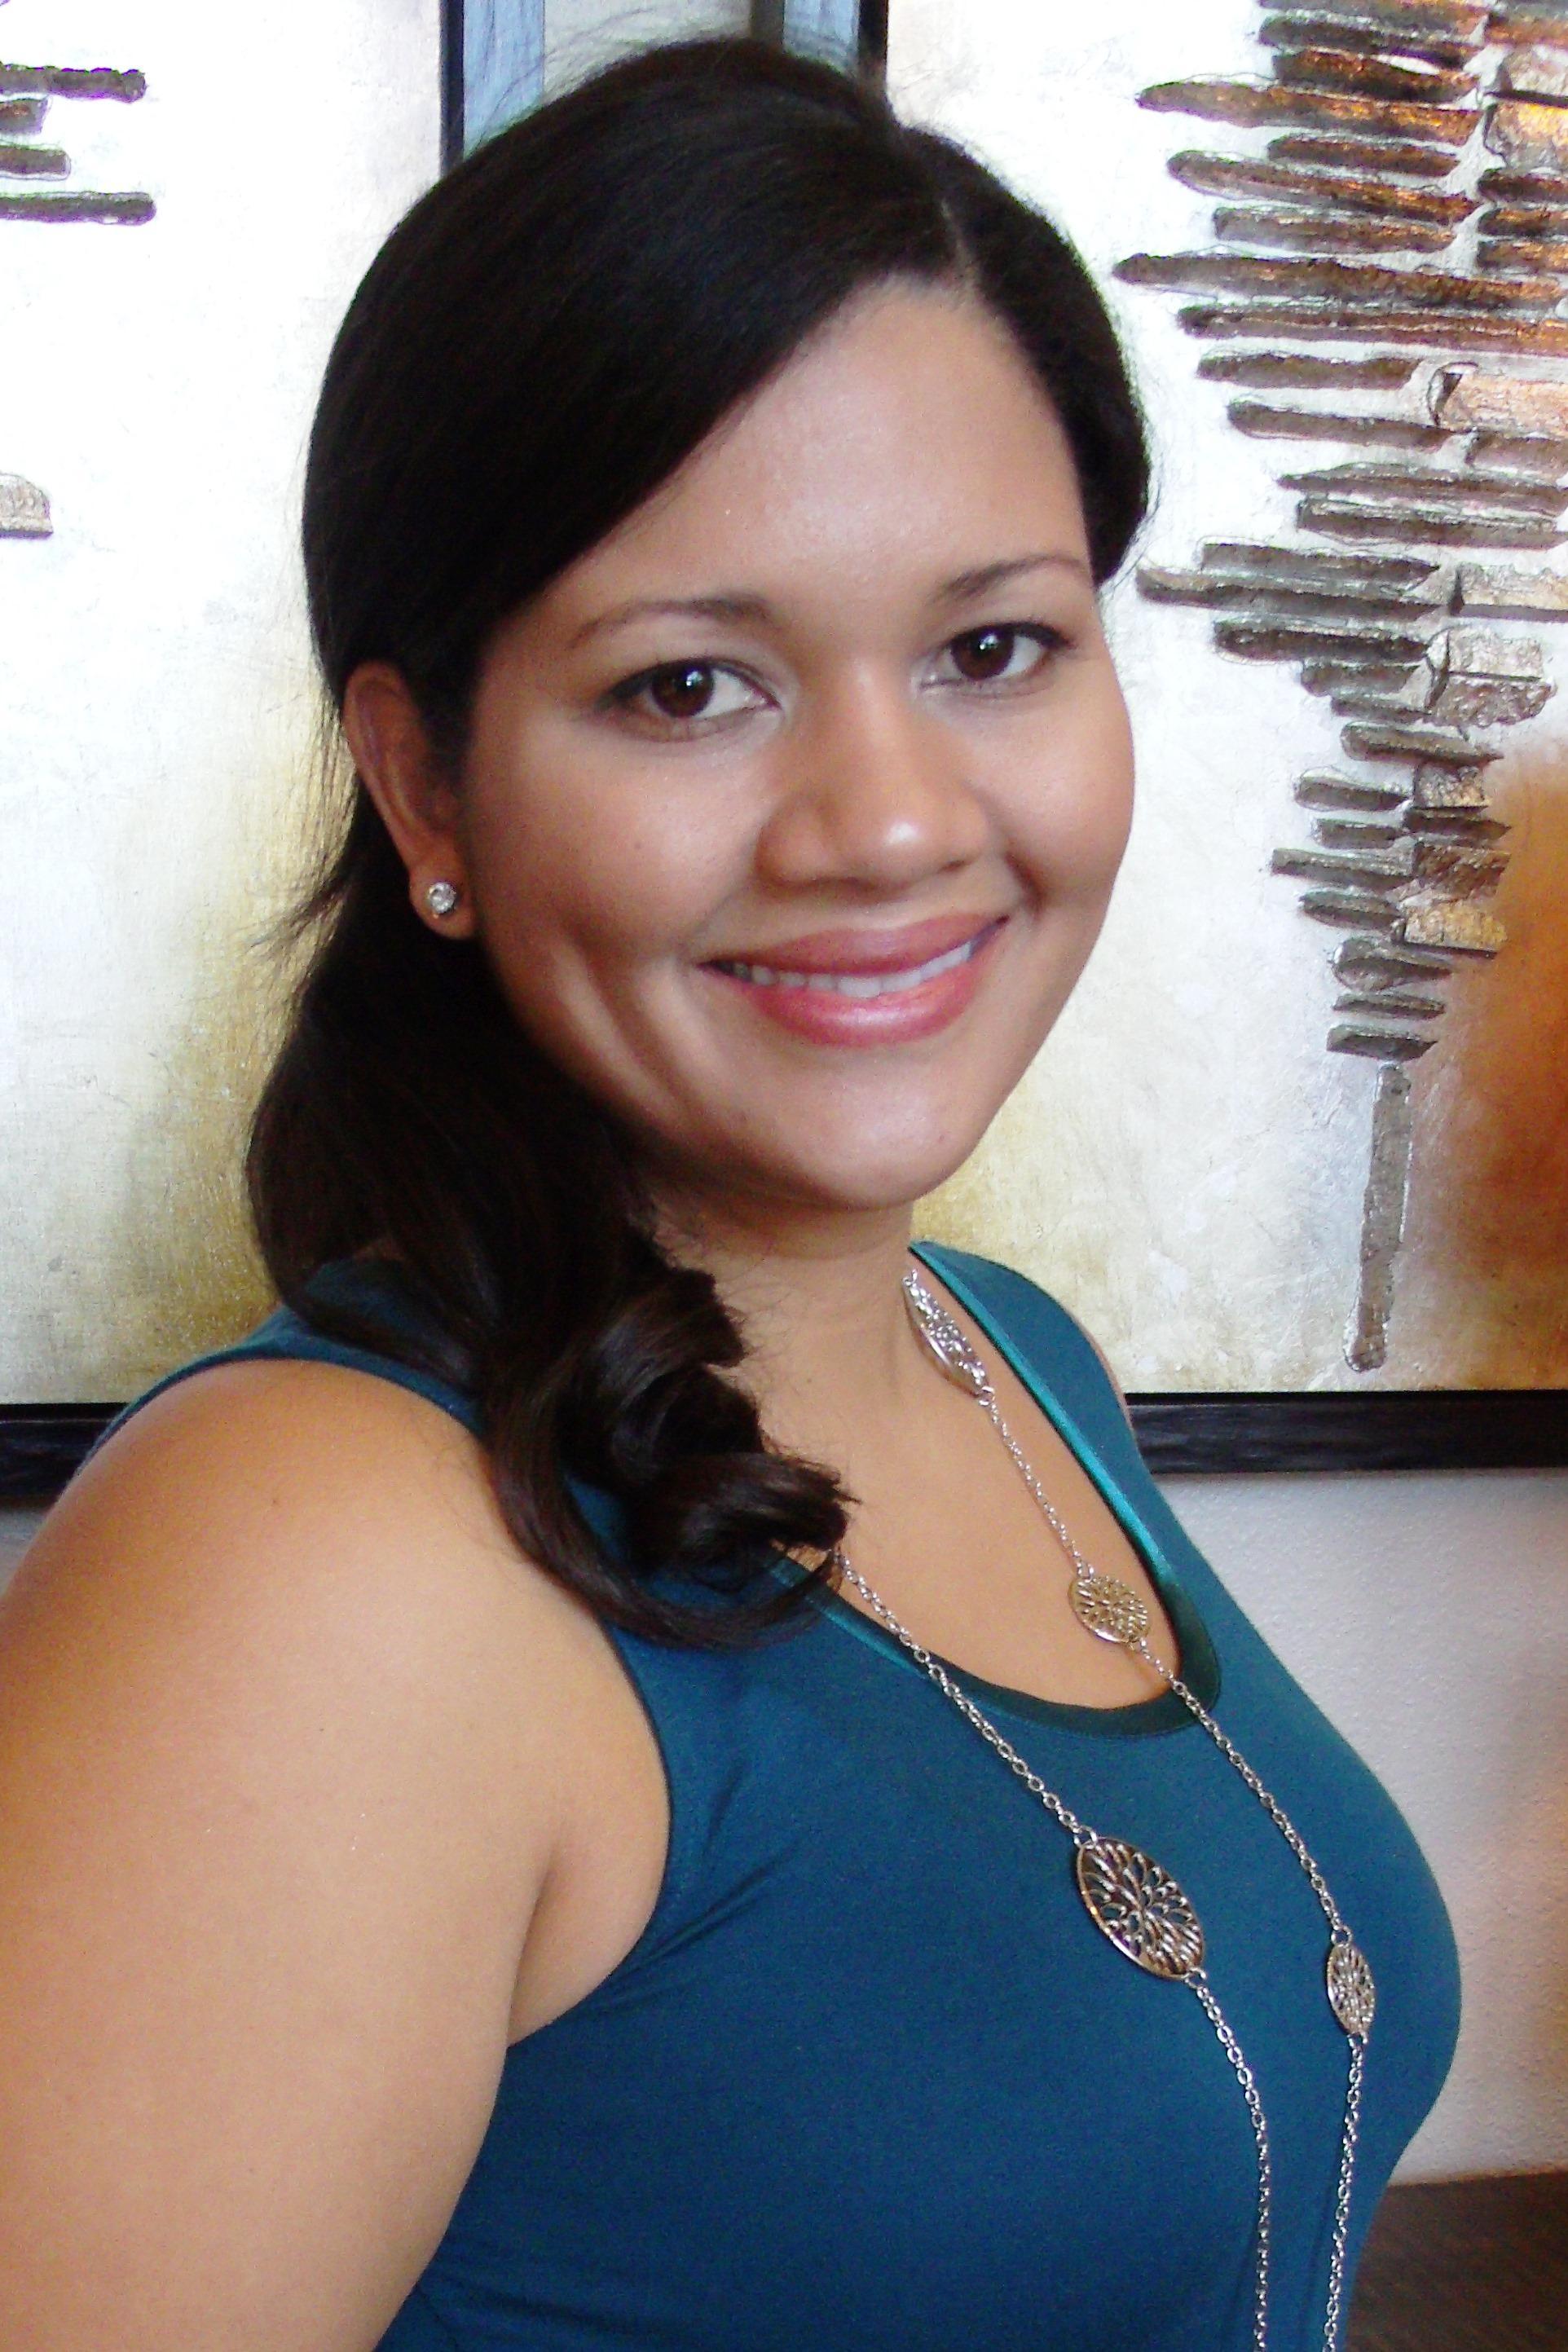 Find a Licensed Professional Counselor - Vivian D. Echevarria Guzman, MSC, CPL, NCC